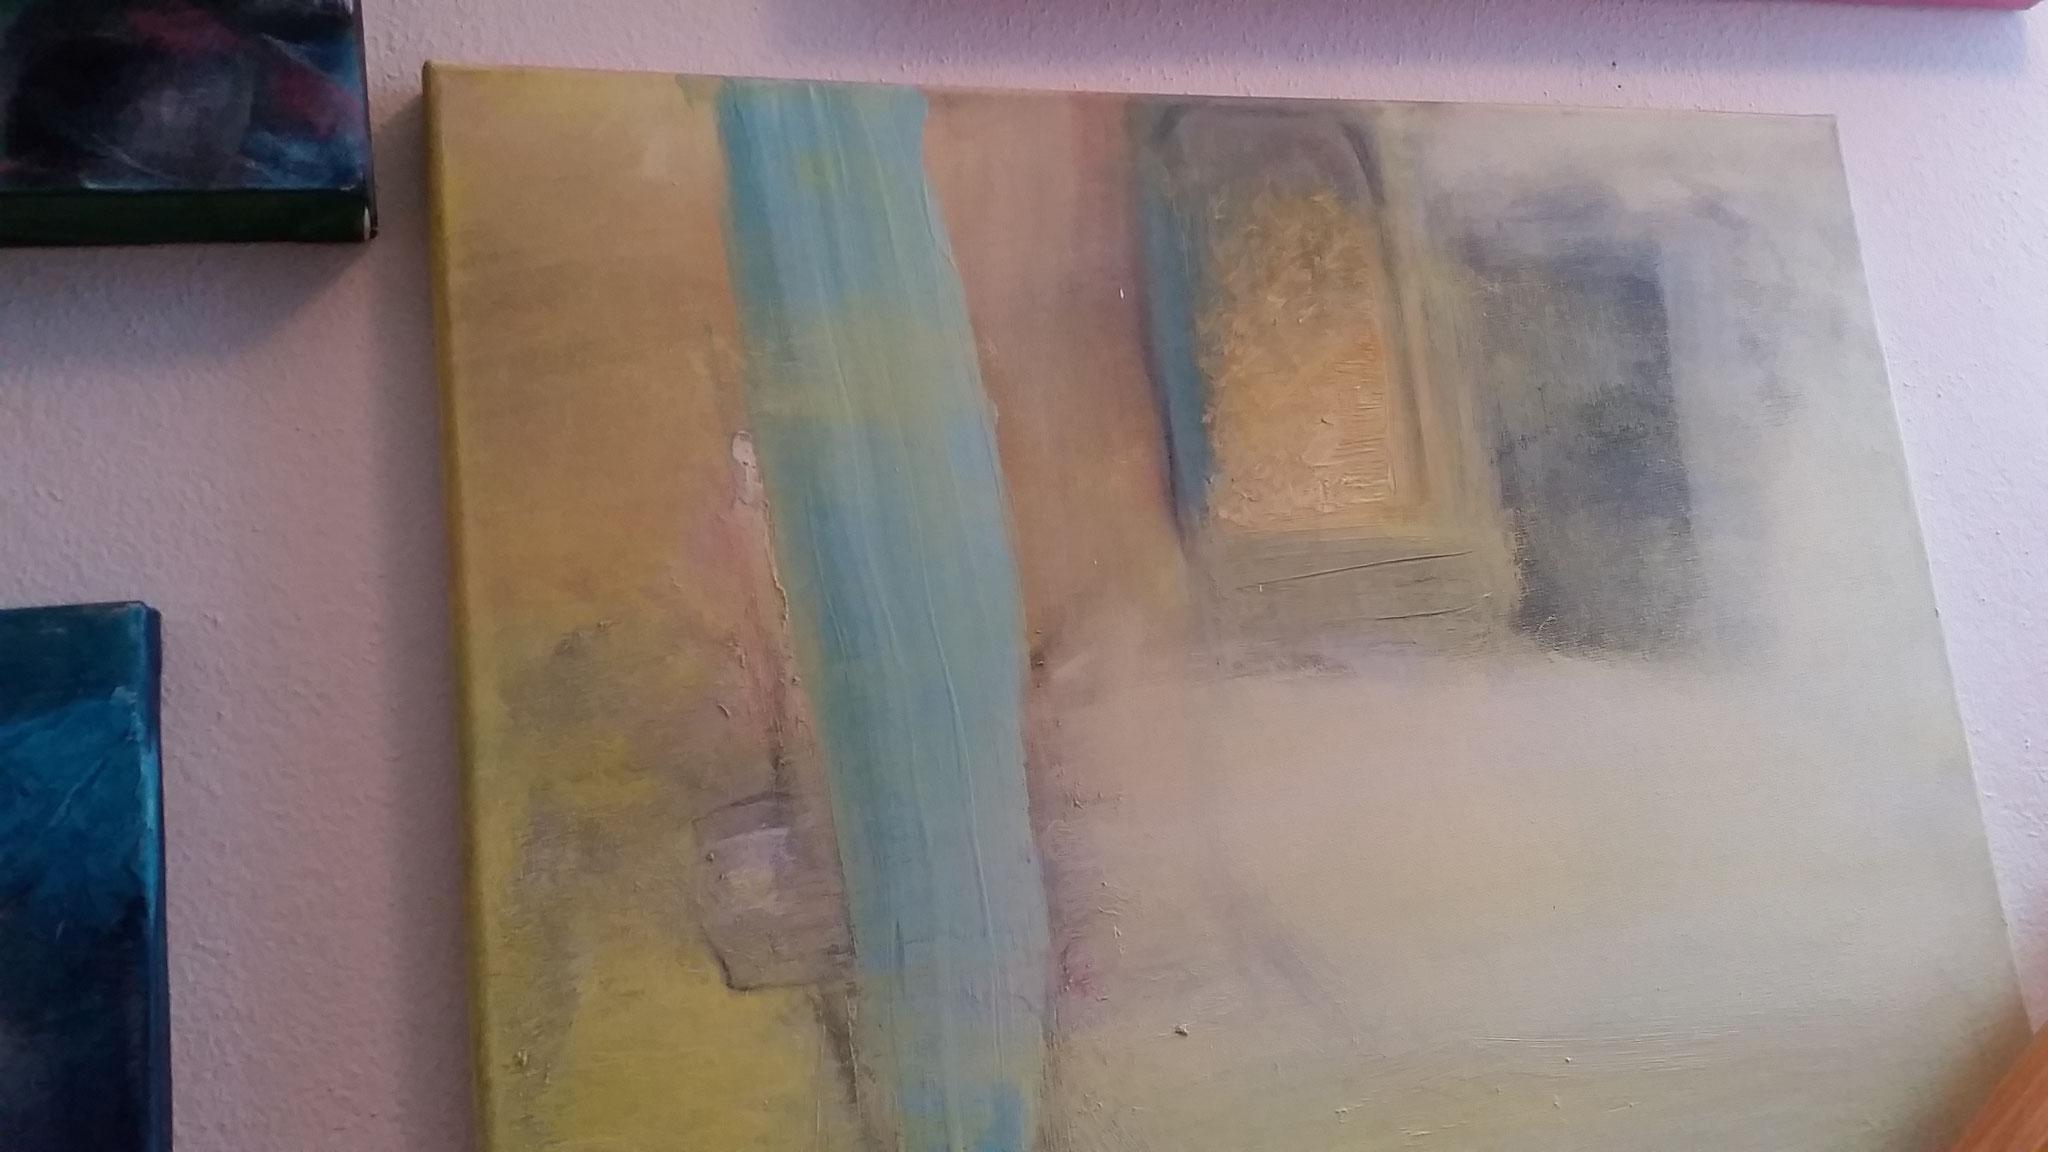 Treppen-Galerie 21, Maler Künstlerin Bozana